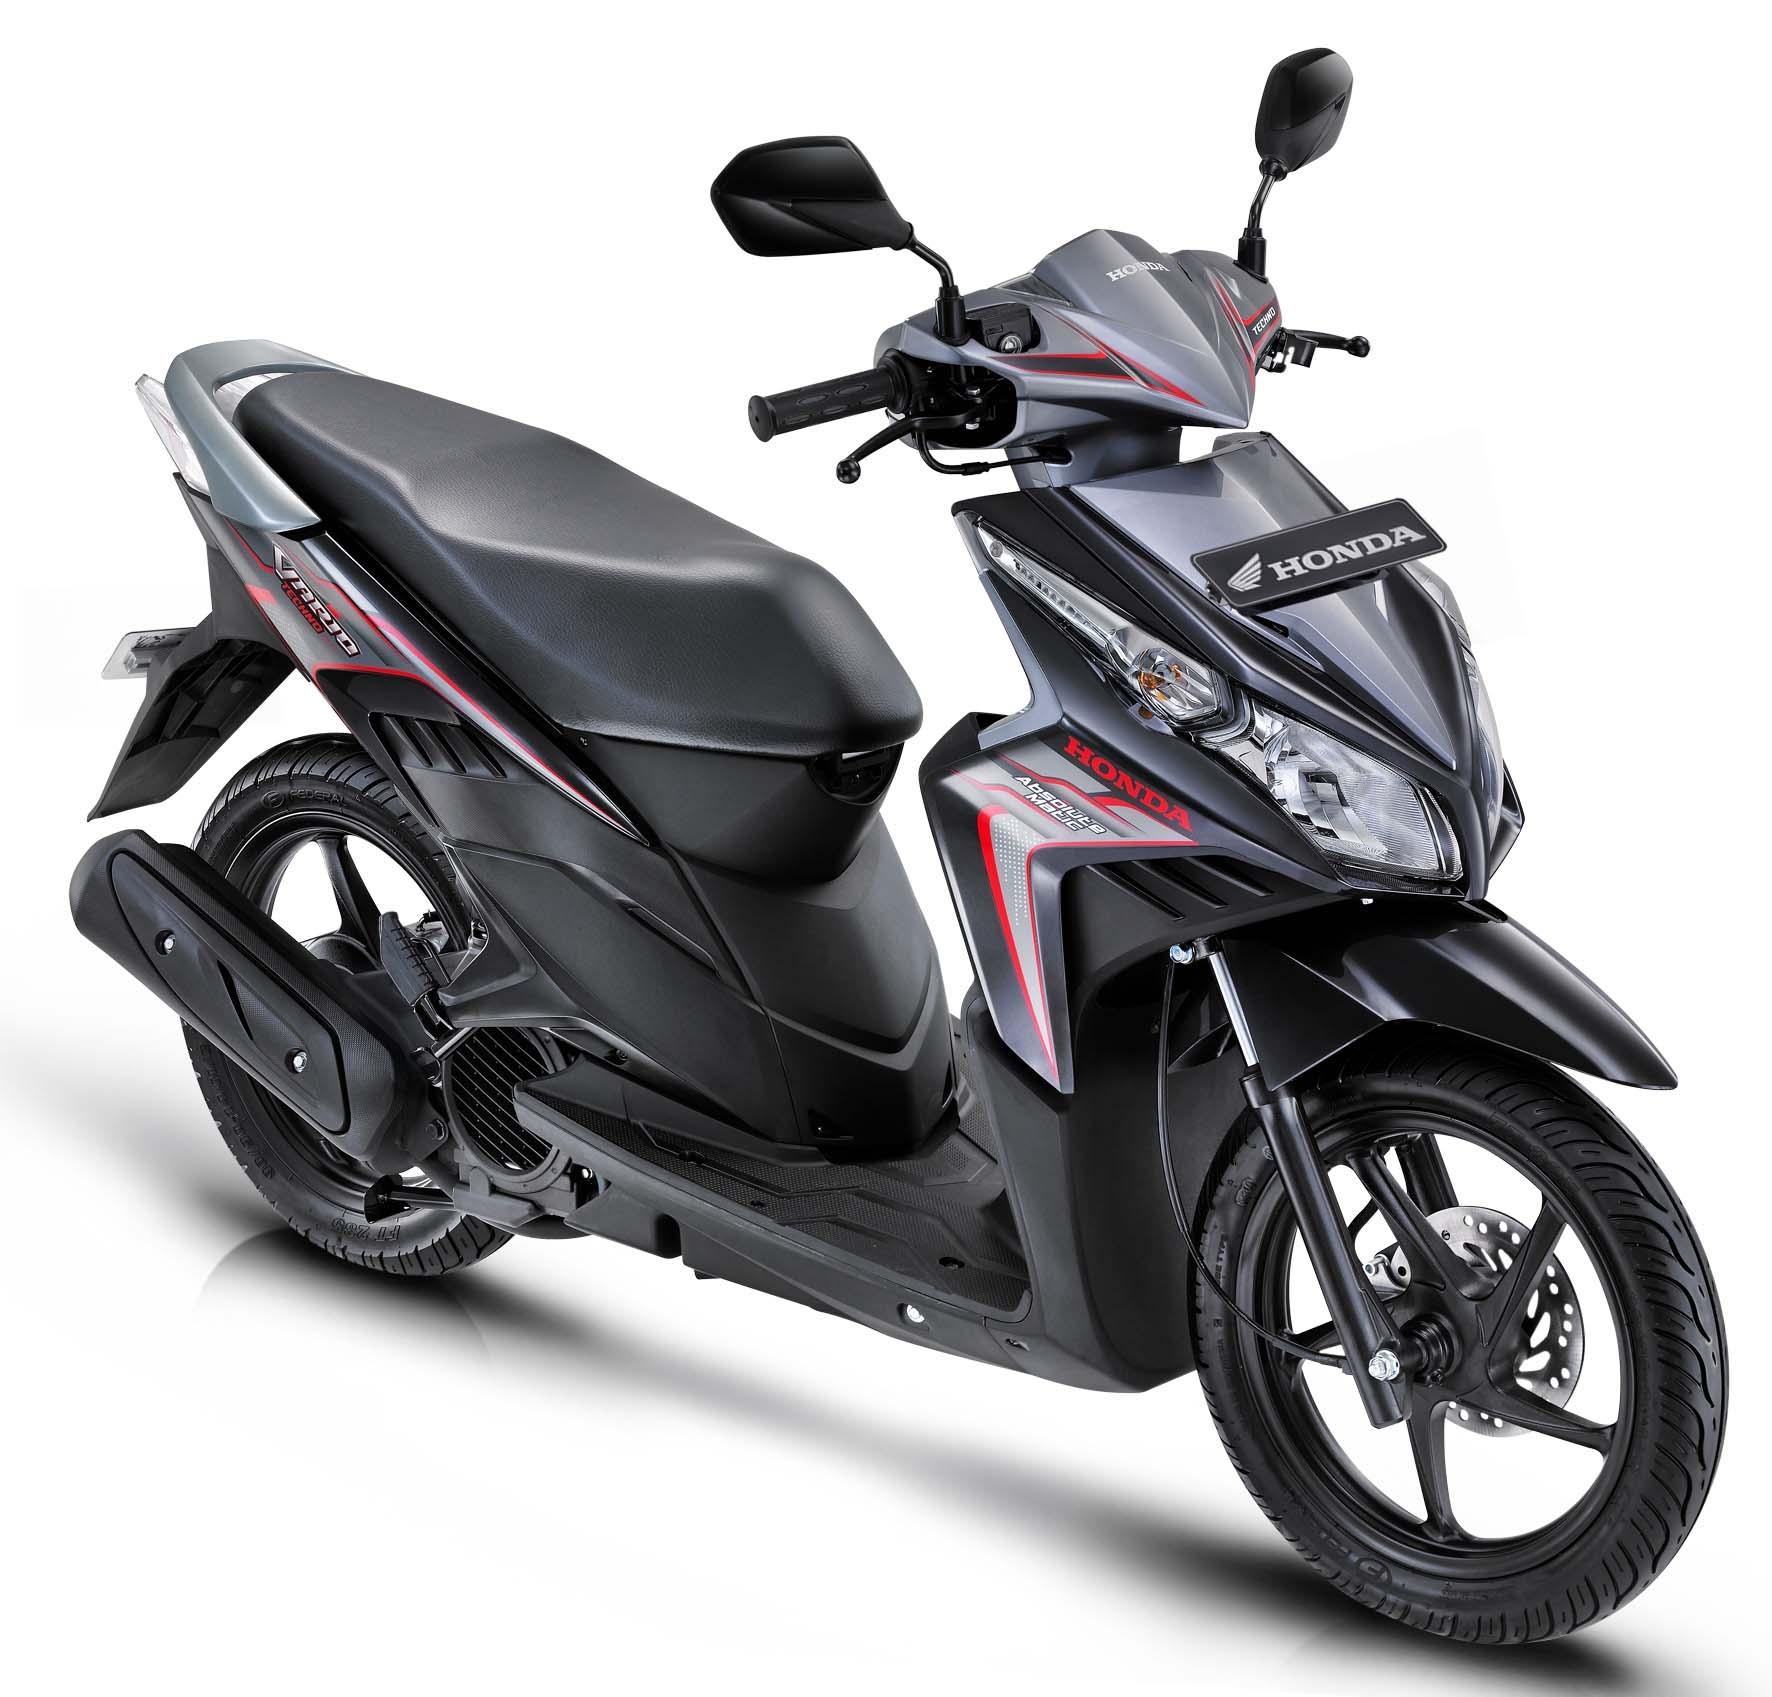 Inilah Varian Baru Honda Vario